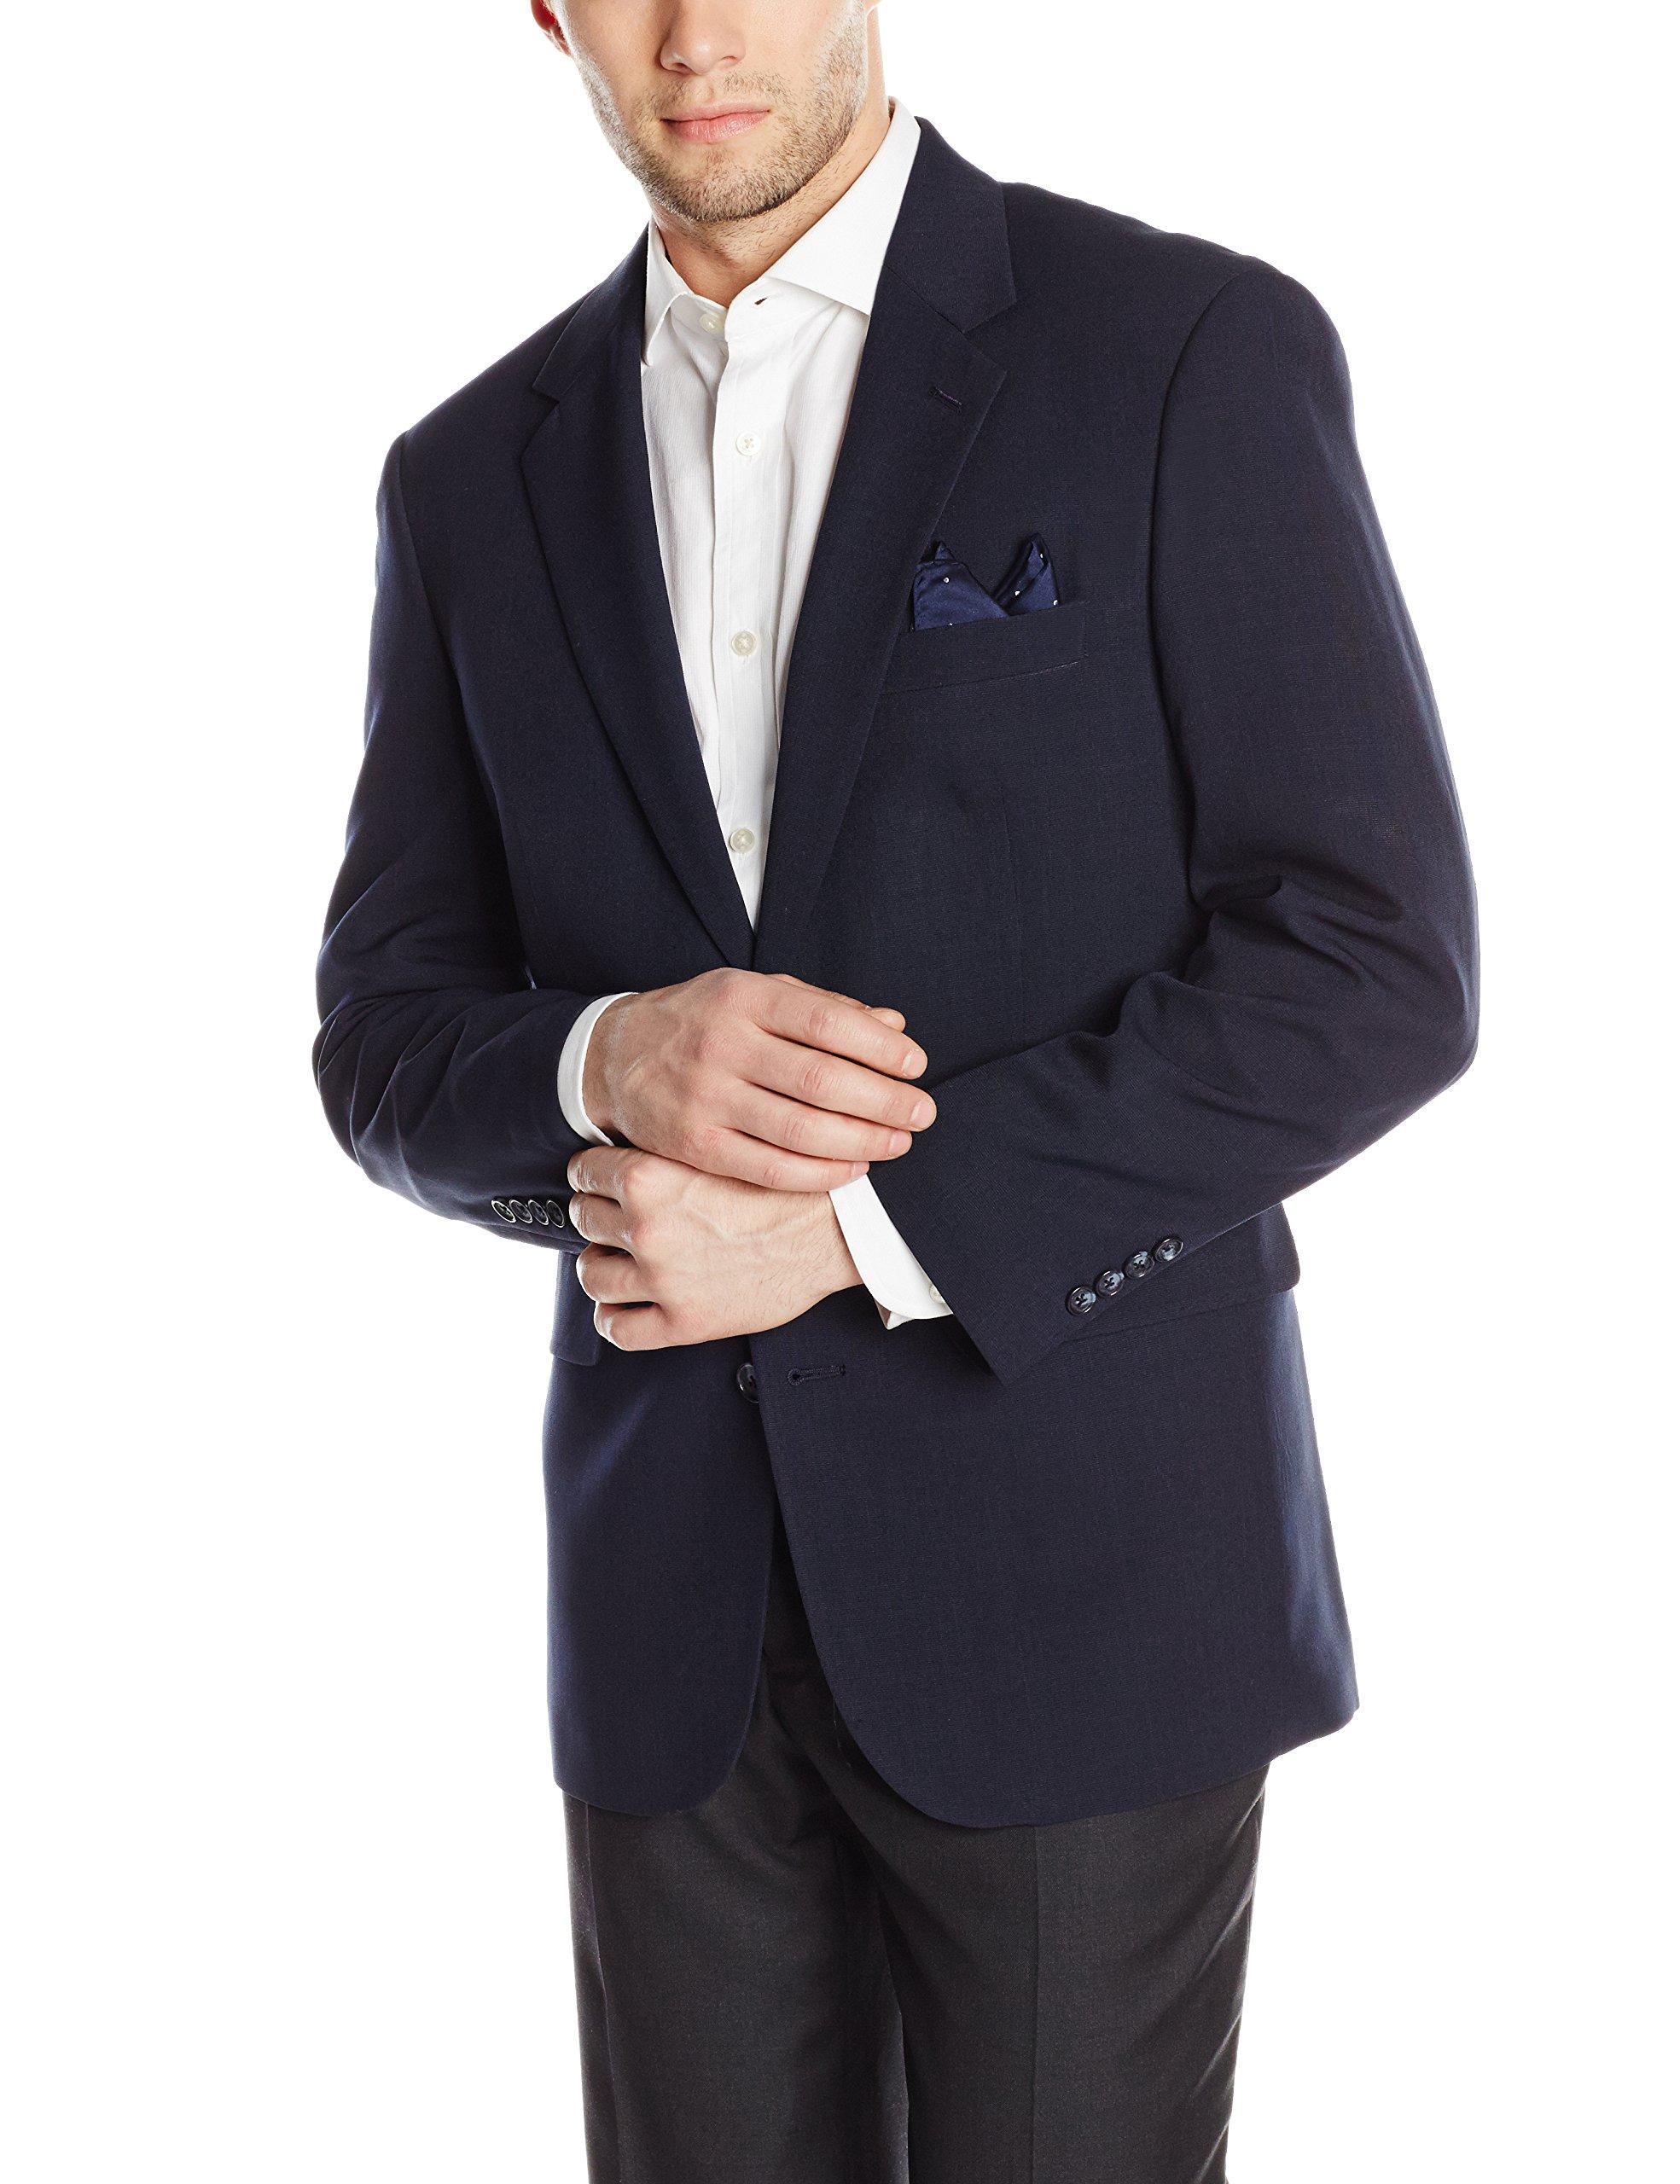 Louis Raphael Men's Tailored Classic Fit 2 Button Center Vent Jacket, Navy, 40 Regular